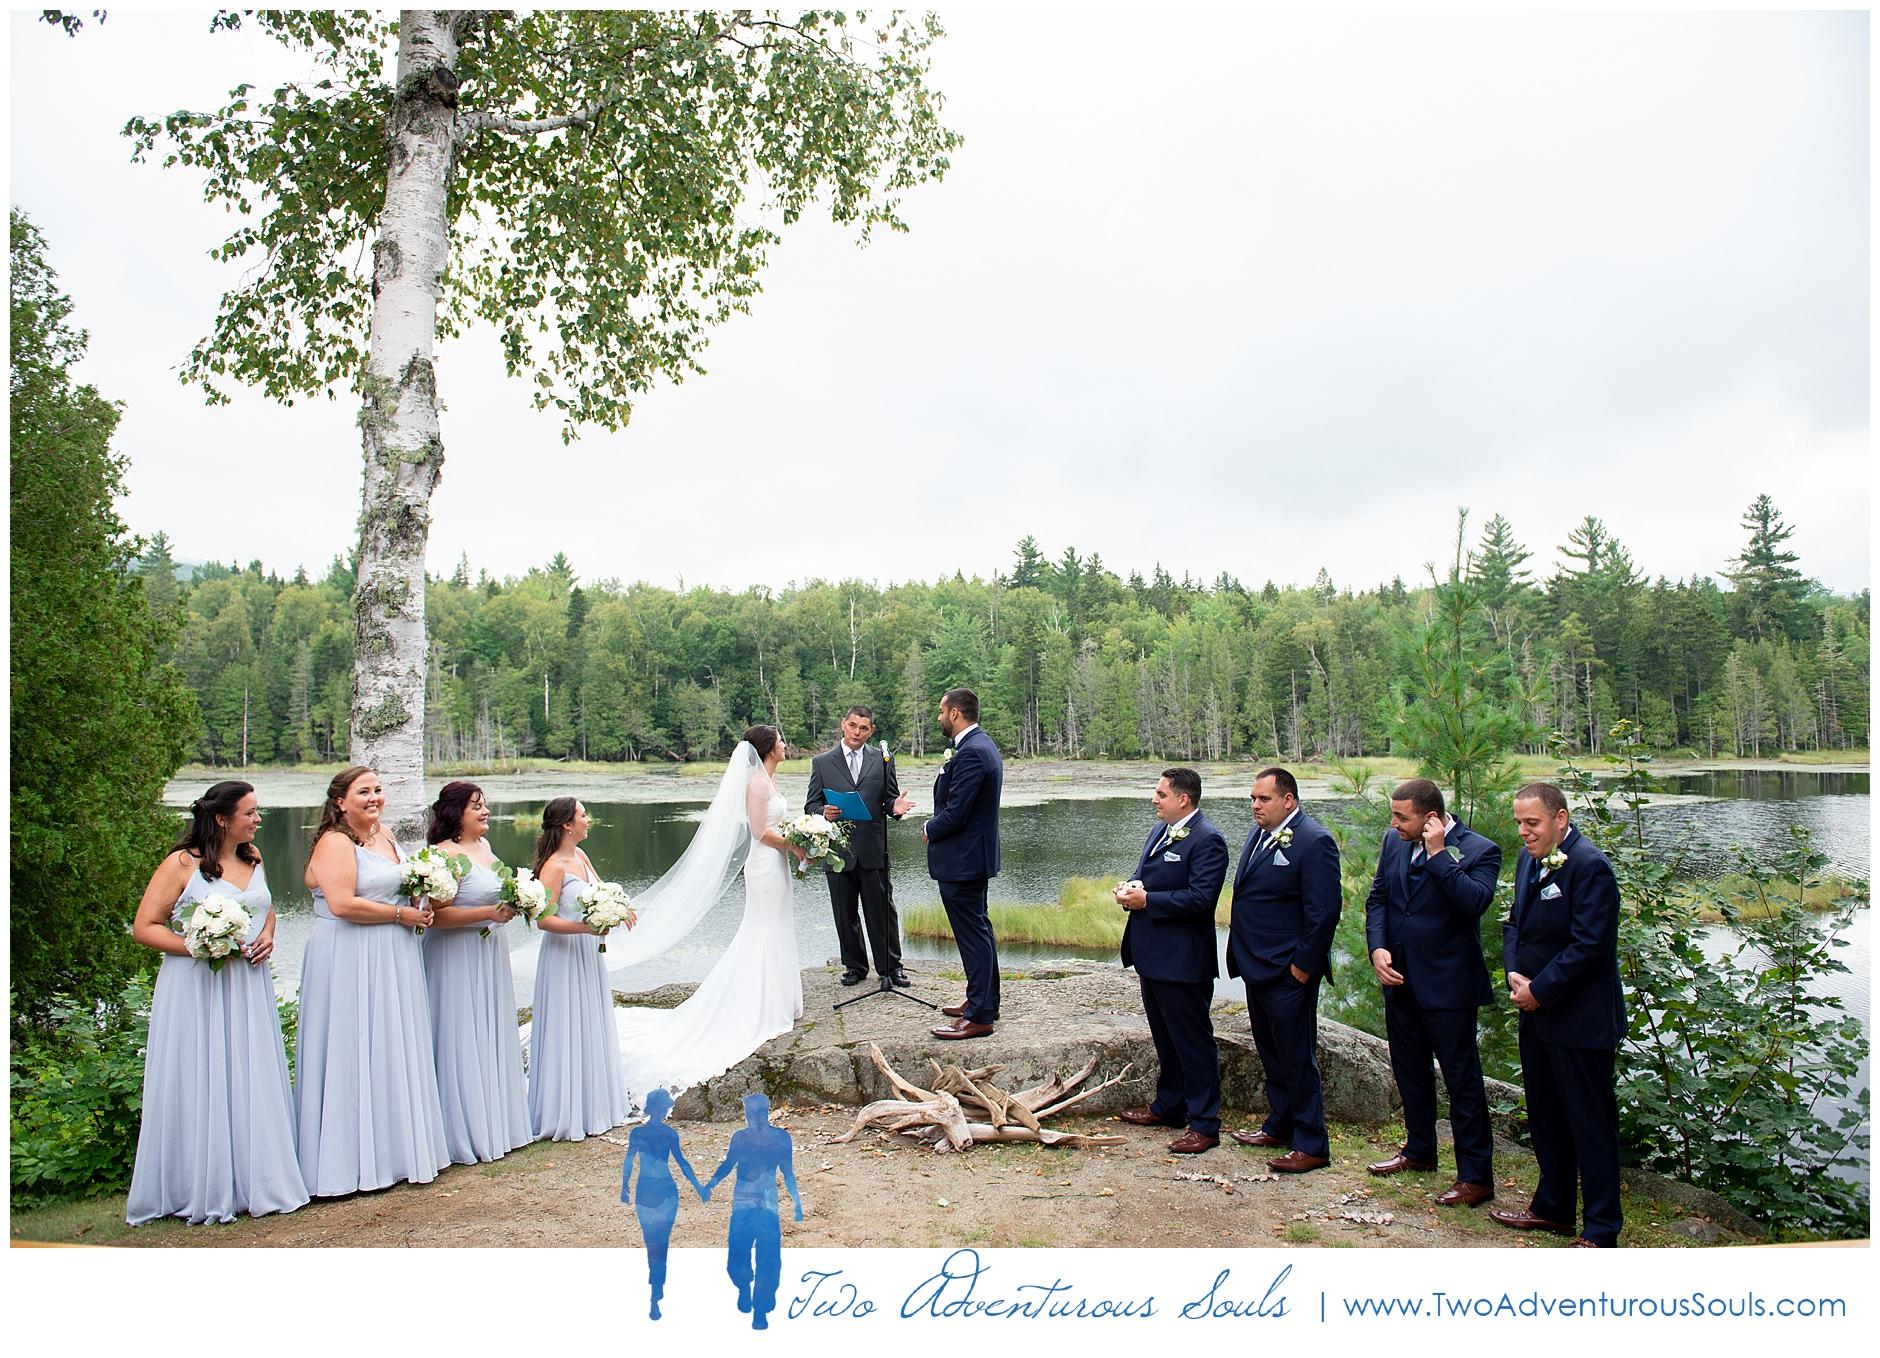 Sugarloaf Outdoor Center Wedding Photographers, Destination Wedding Photographers, Two Adventurous Souls-081719_0036.jpg